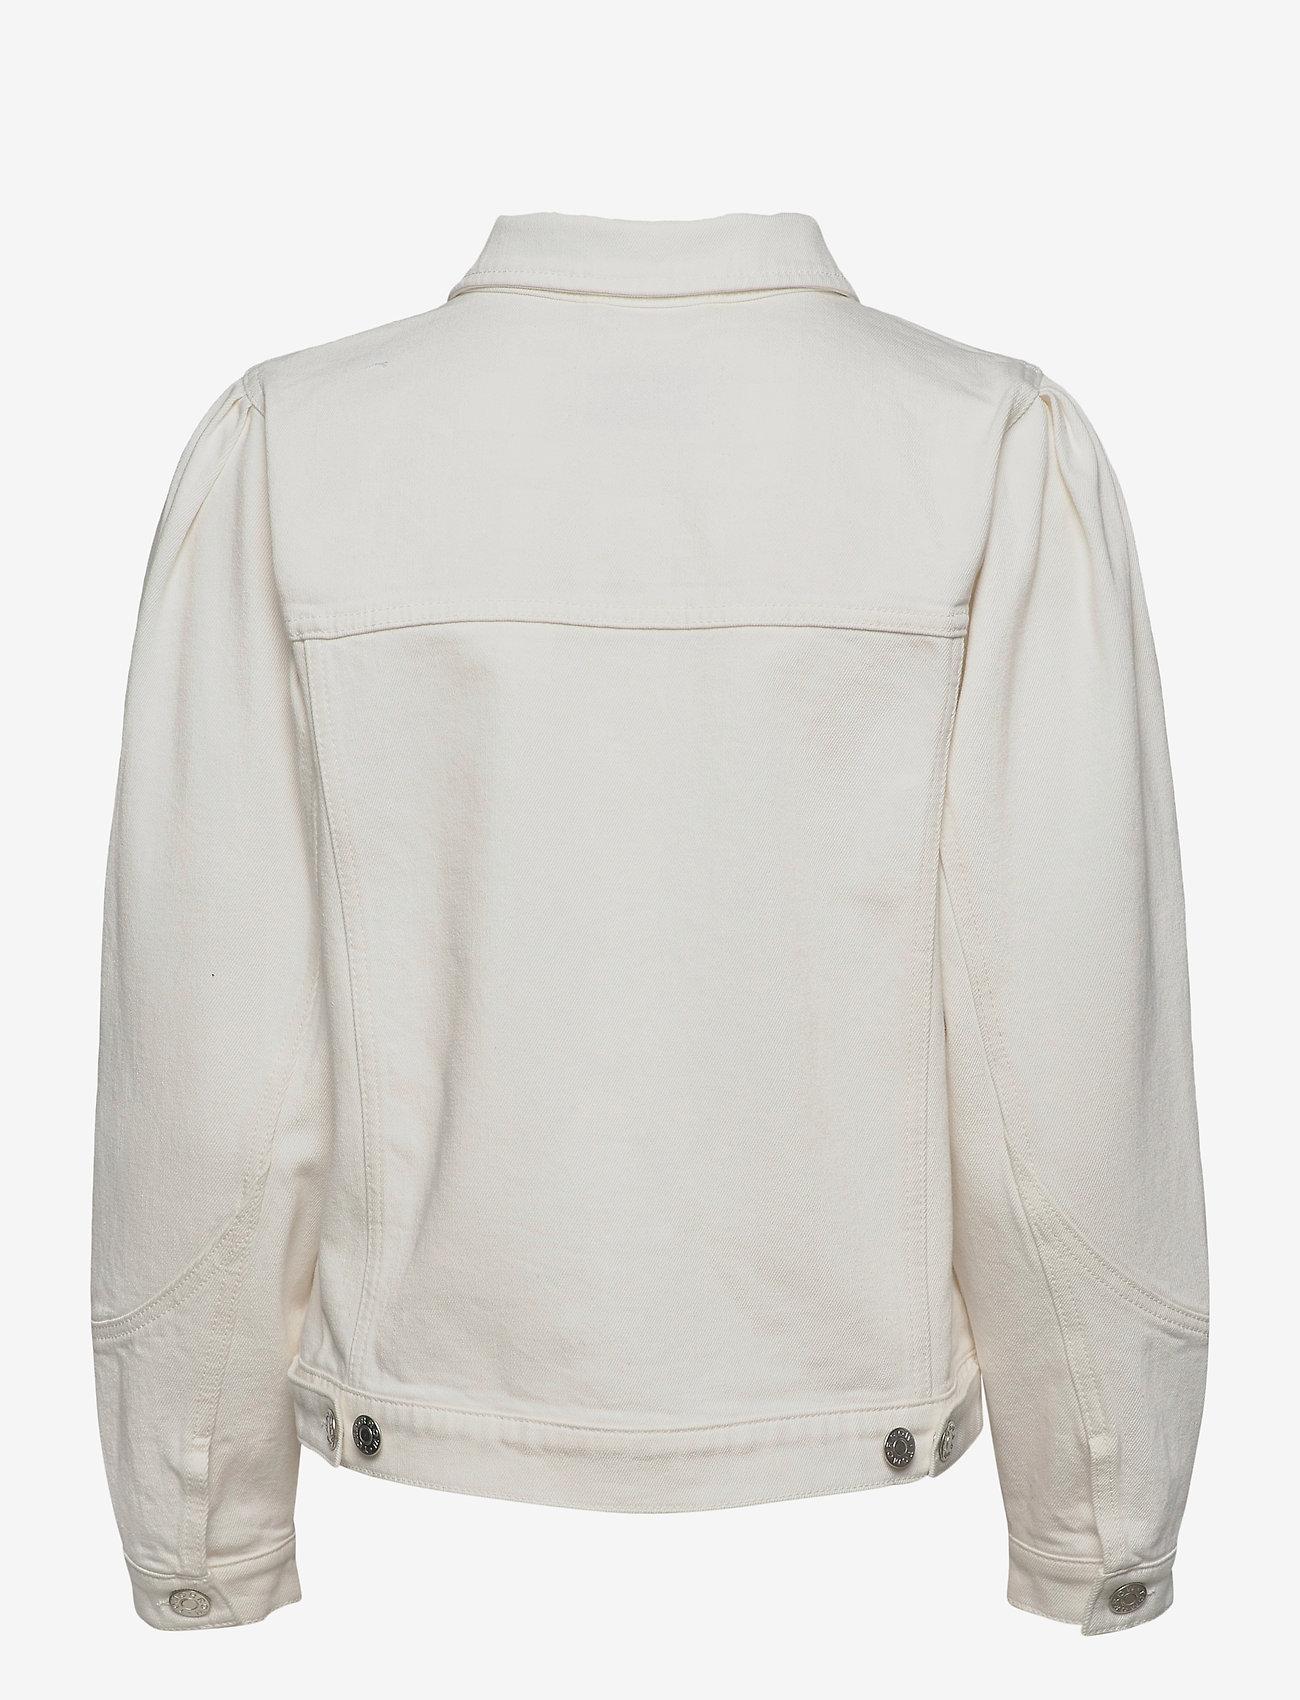 Tomorrow - Kersee puff jacket ecru - jeansjacken - ecru - 1